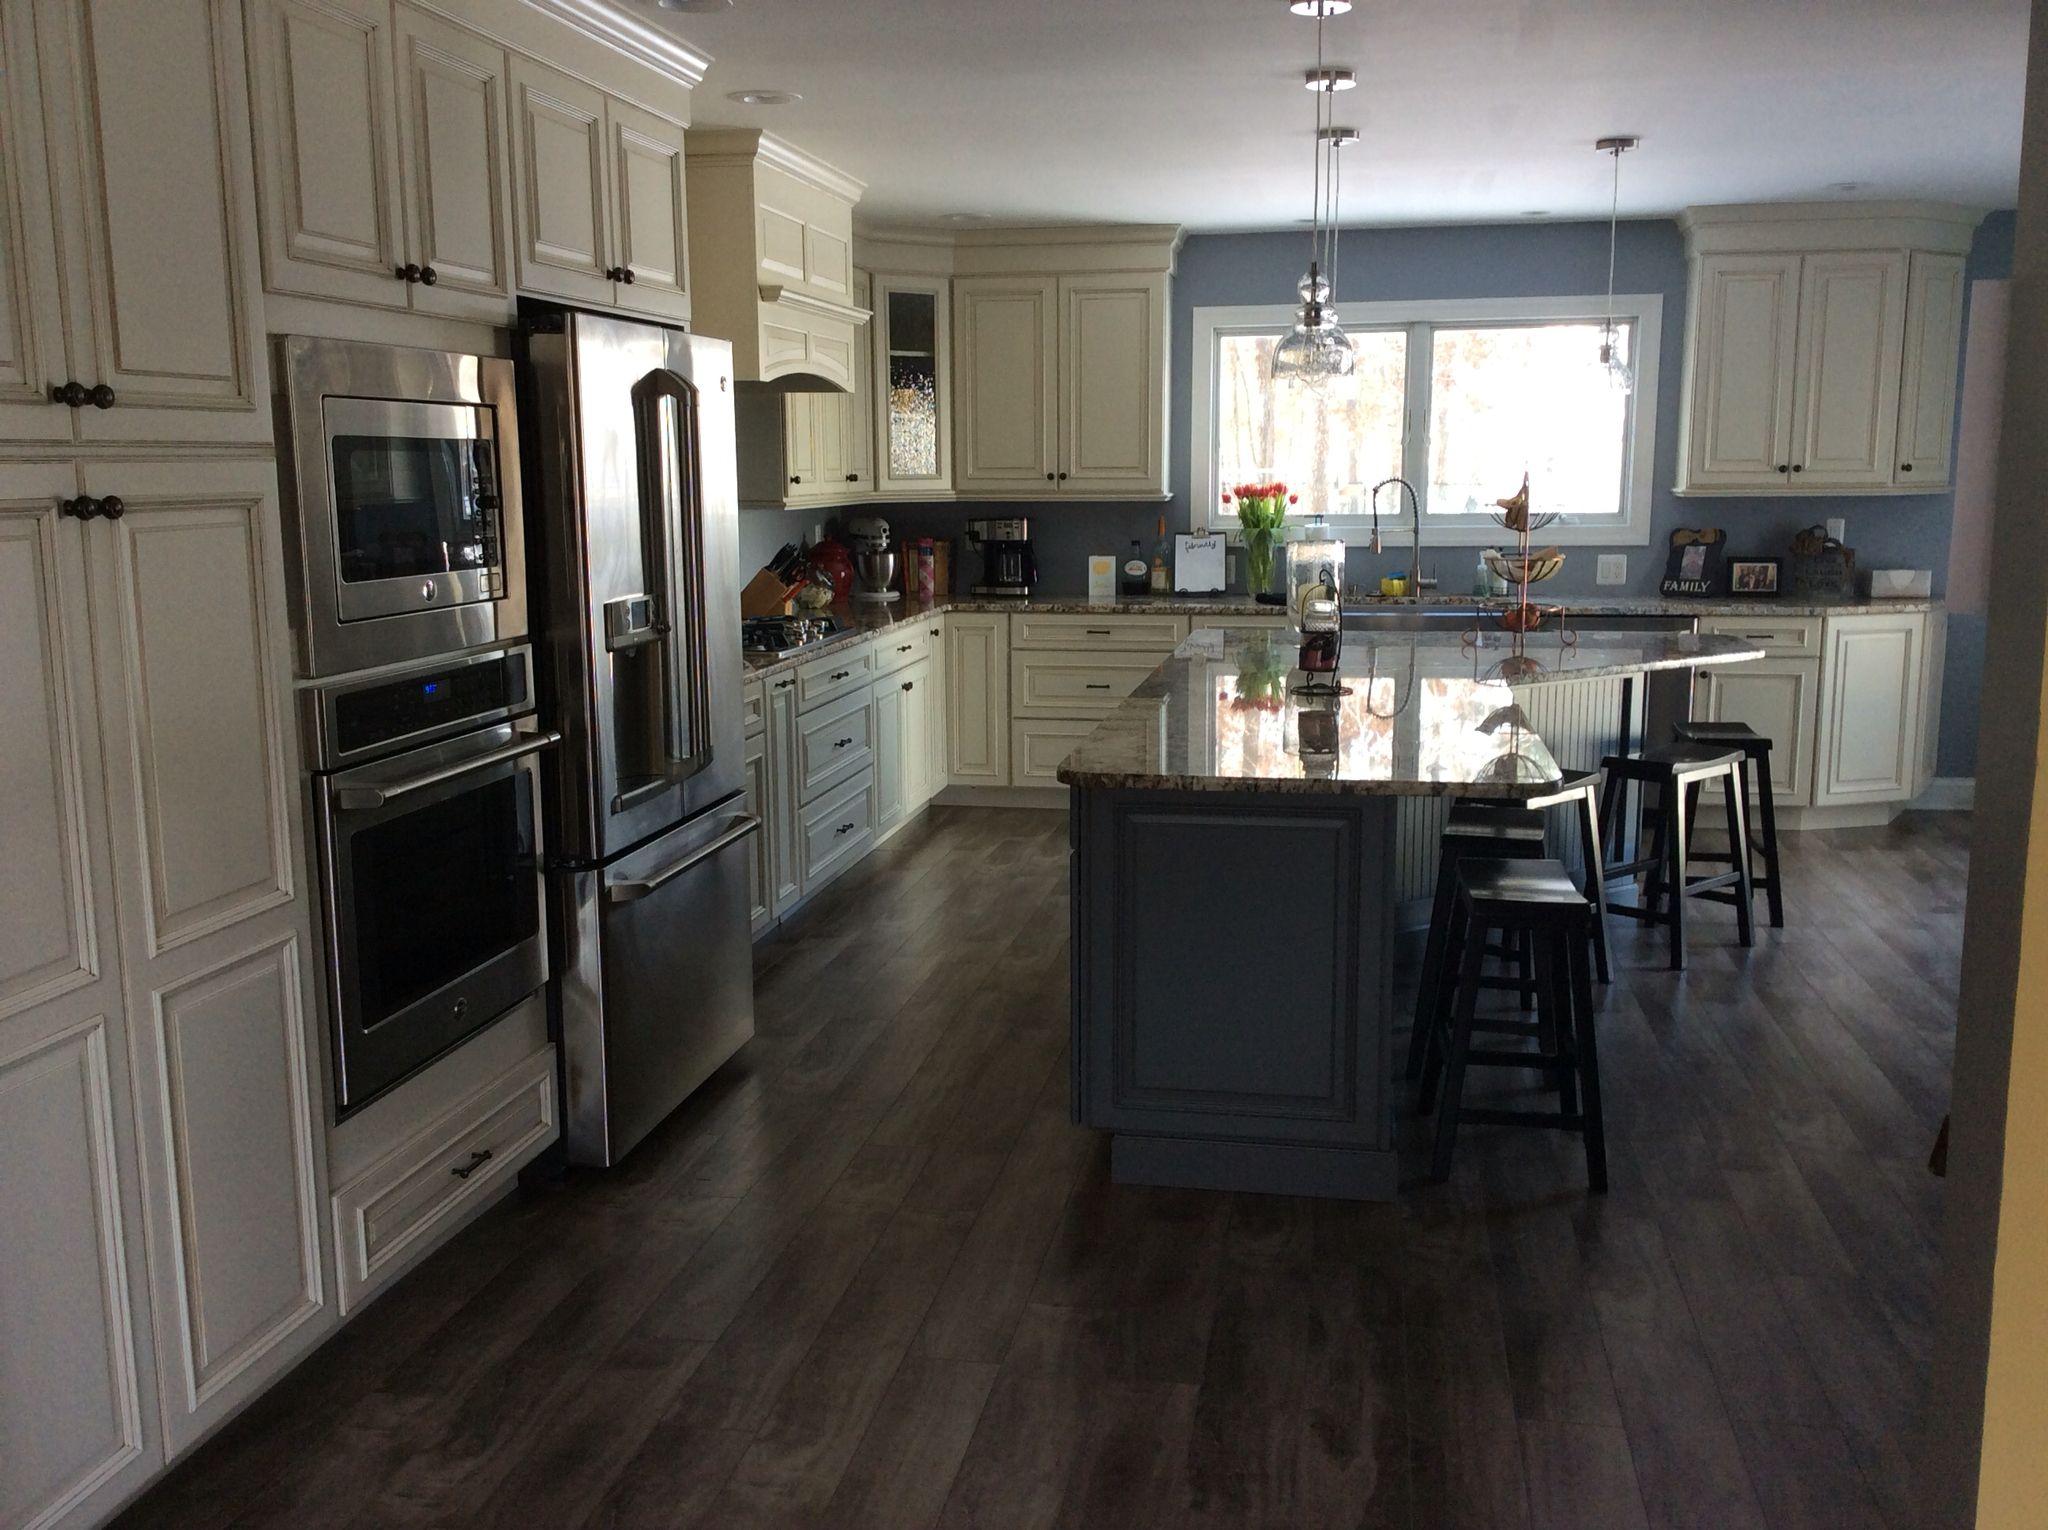 Kitchen Renovation Wellbourne Made Cream Cabinets With Dark Gray